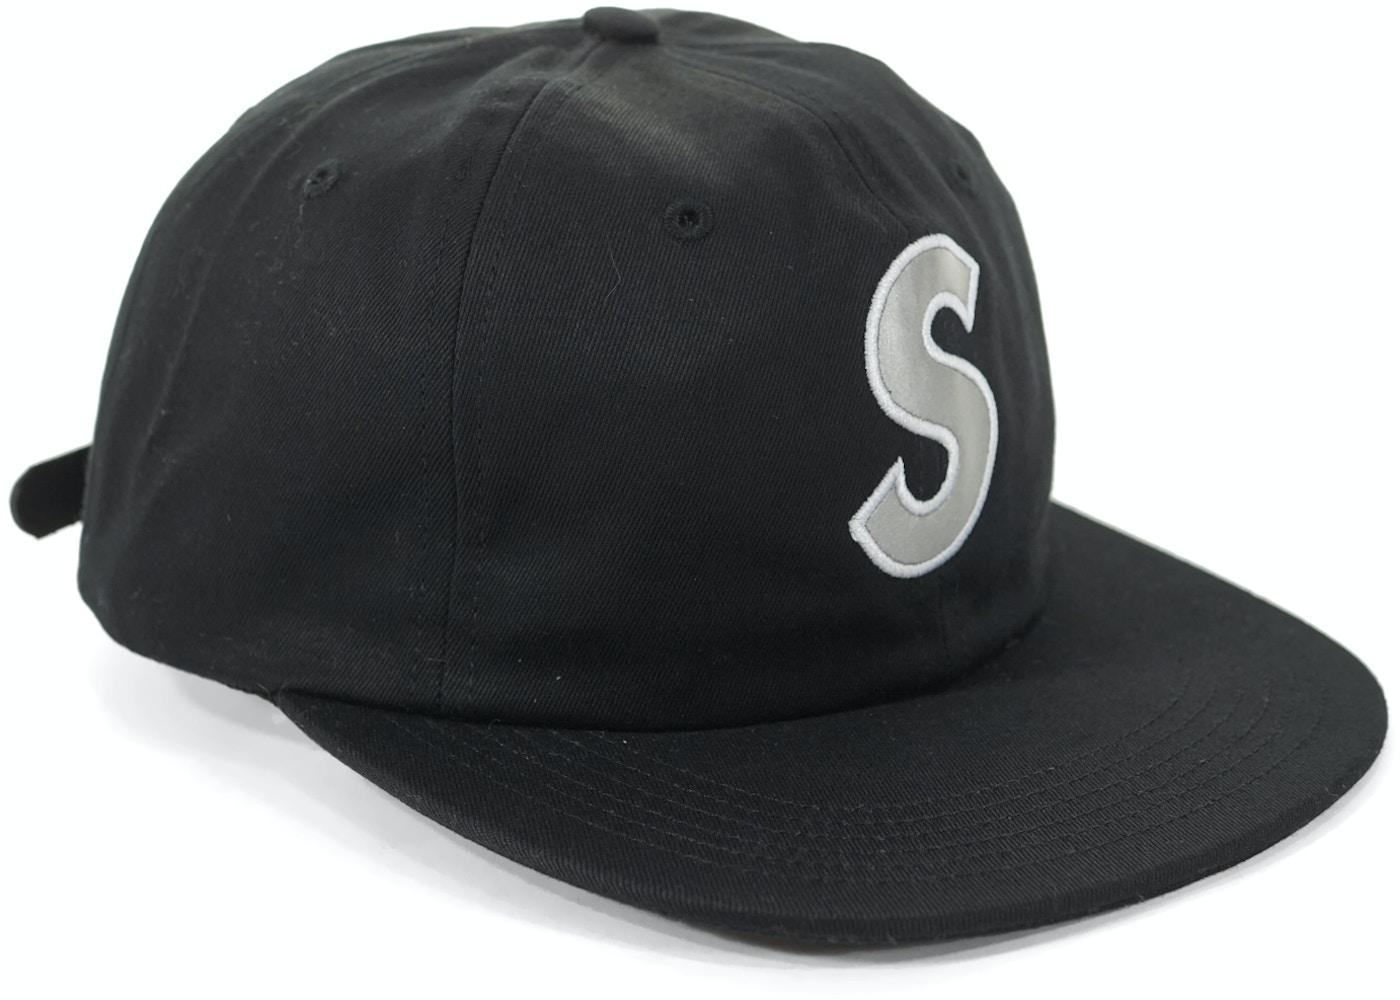 Supreme 3M Reflective S Logo 6 Panel Black - SS16 728d5129c8ad